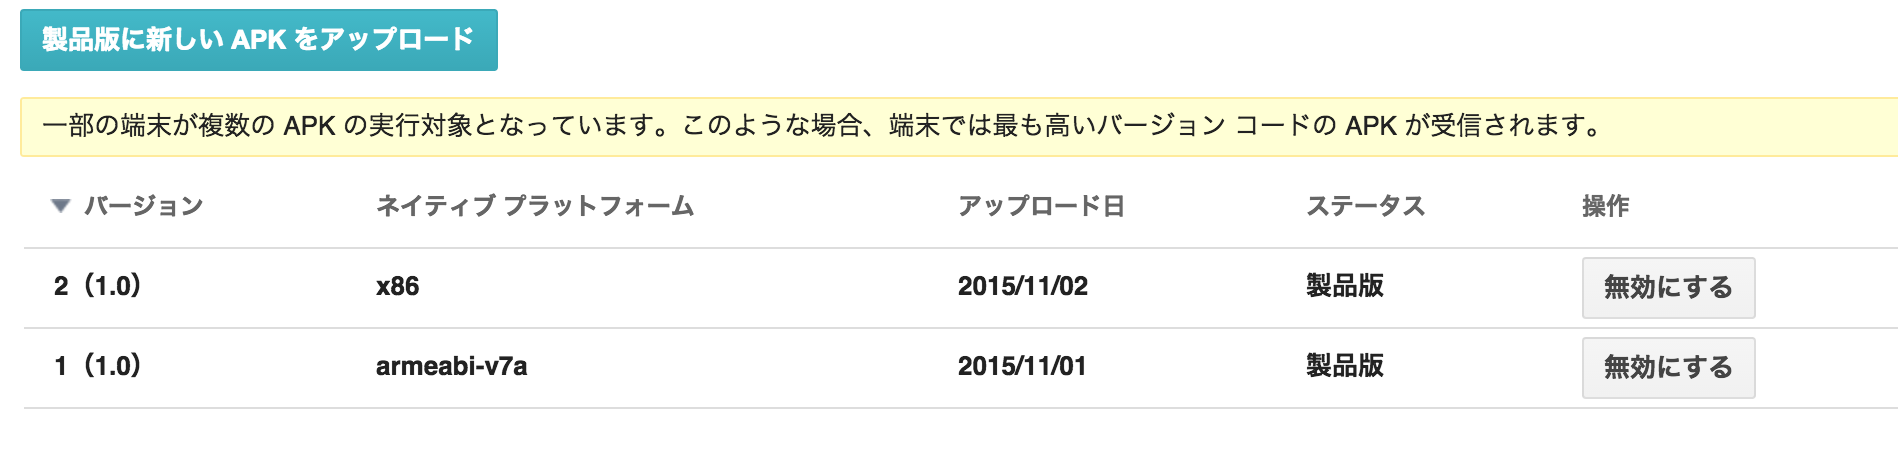 APK   エレファンタ・スティックアタック7   Google Play Developer Console.png